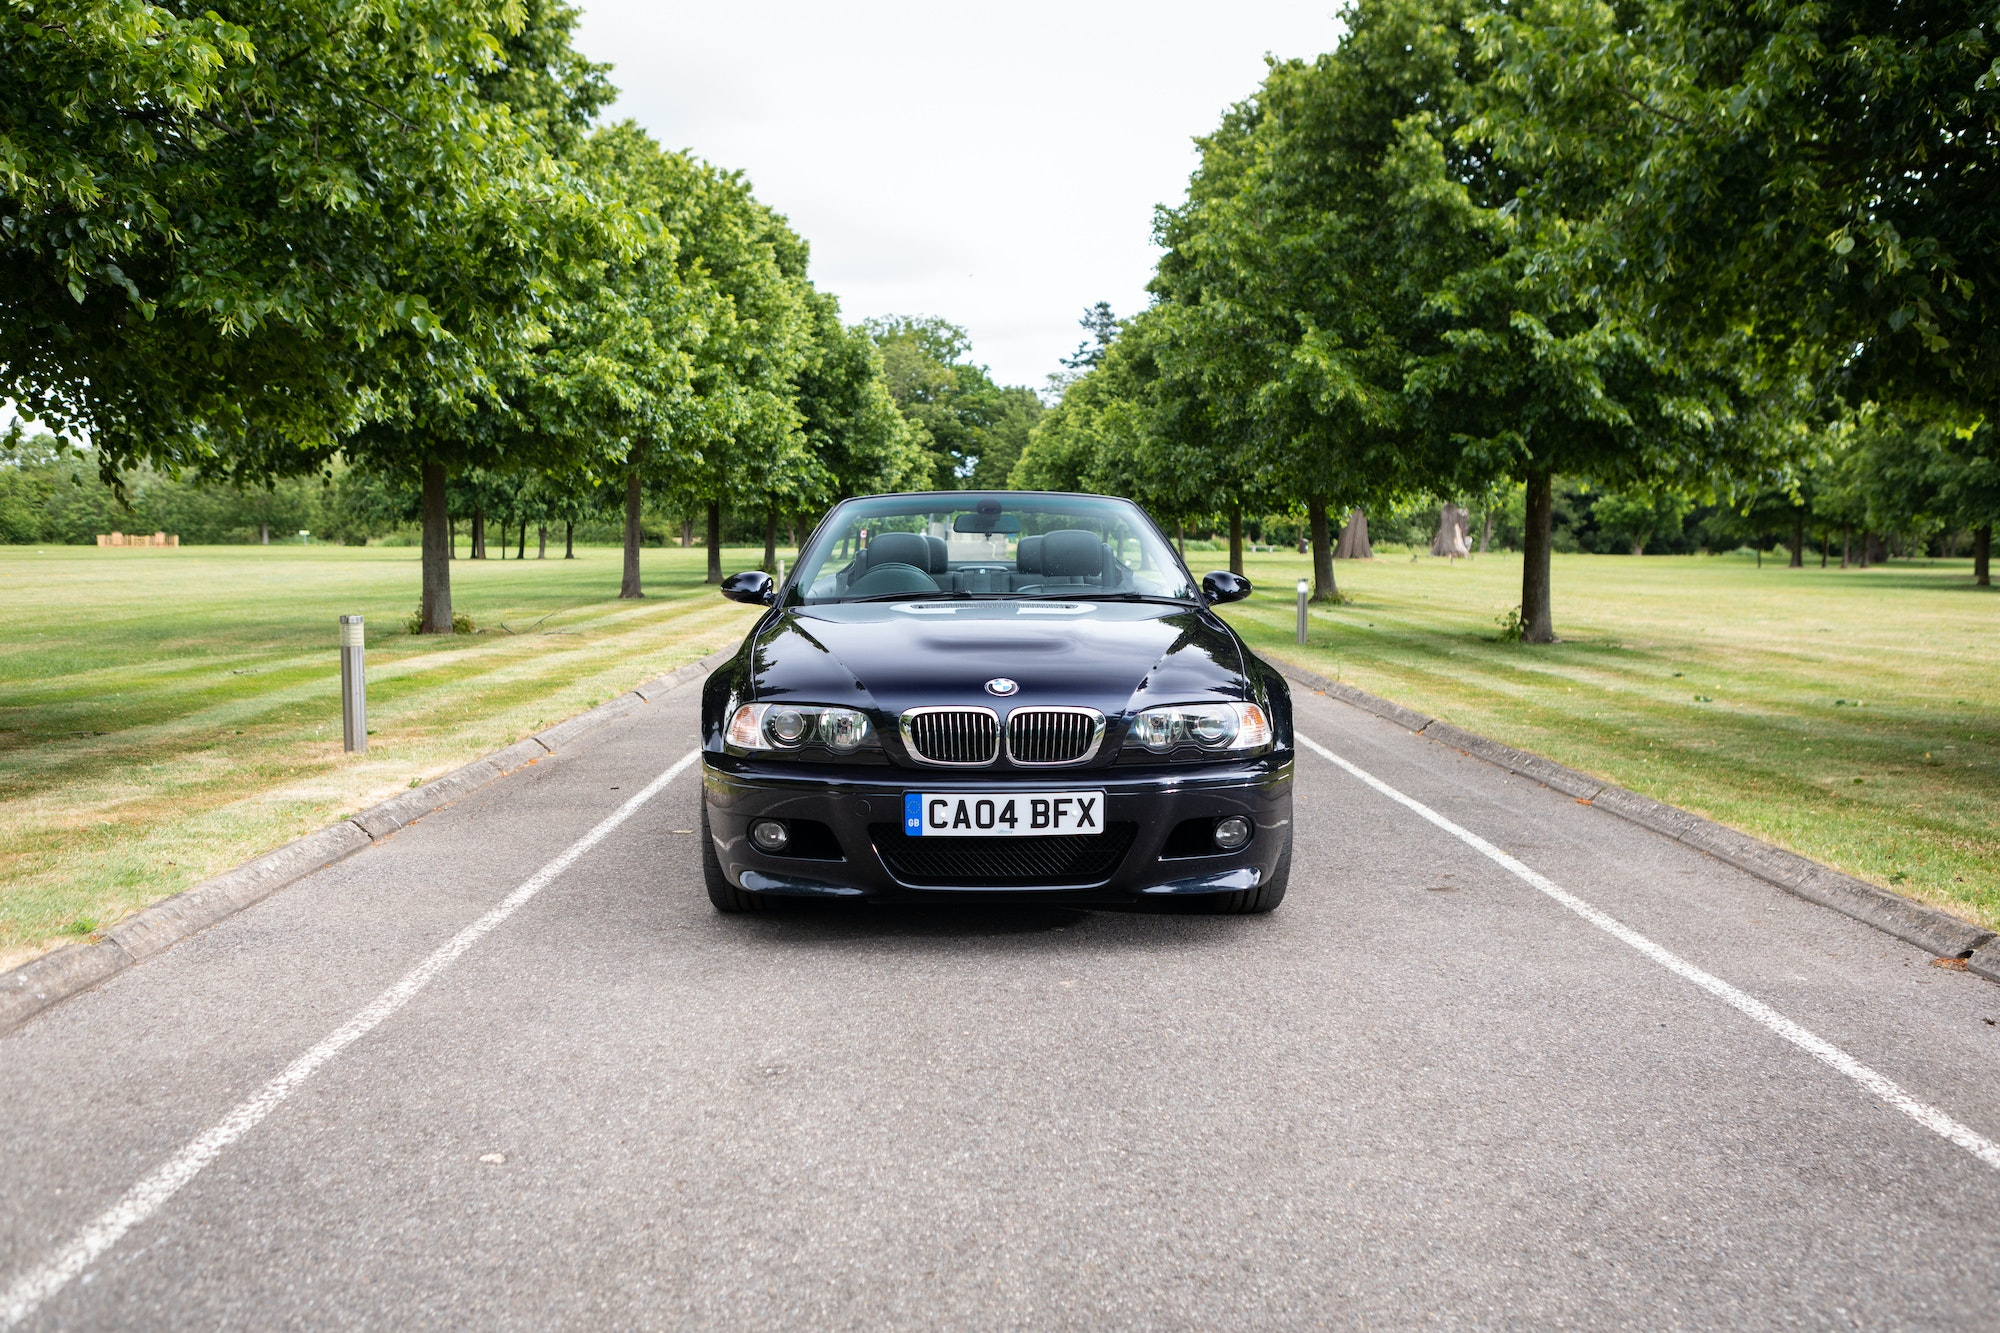 2004 Bmw E46 M3 Convertible